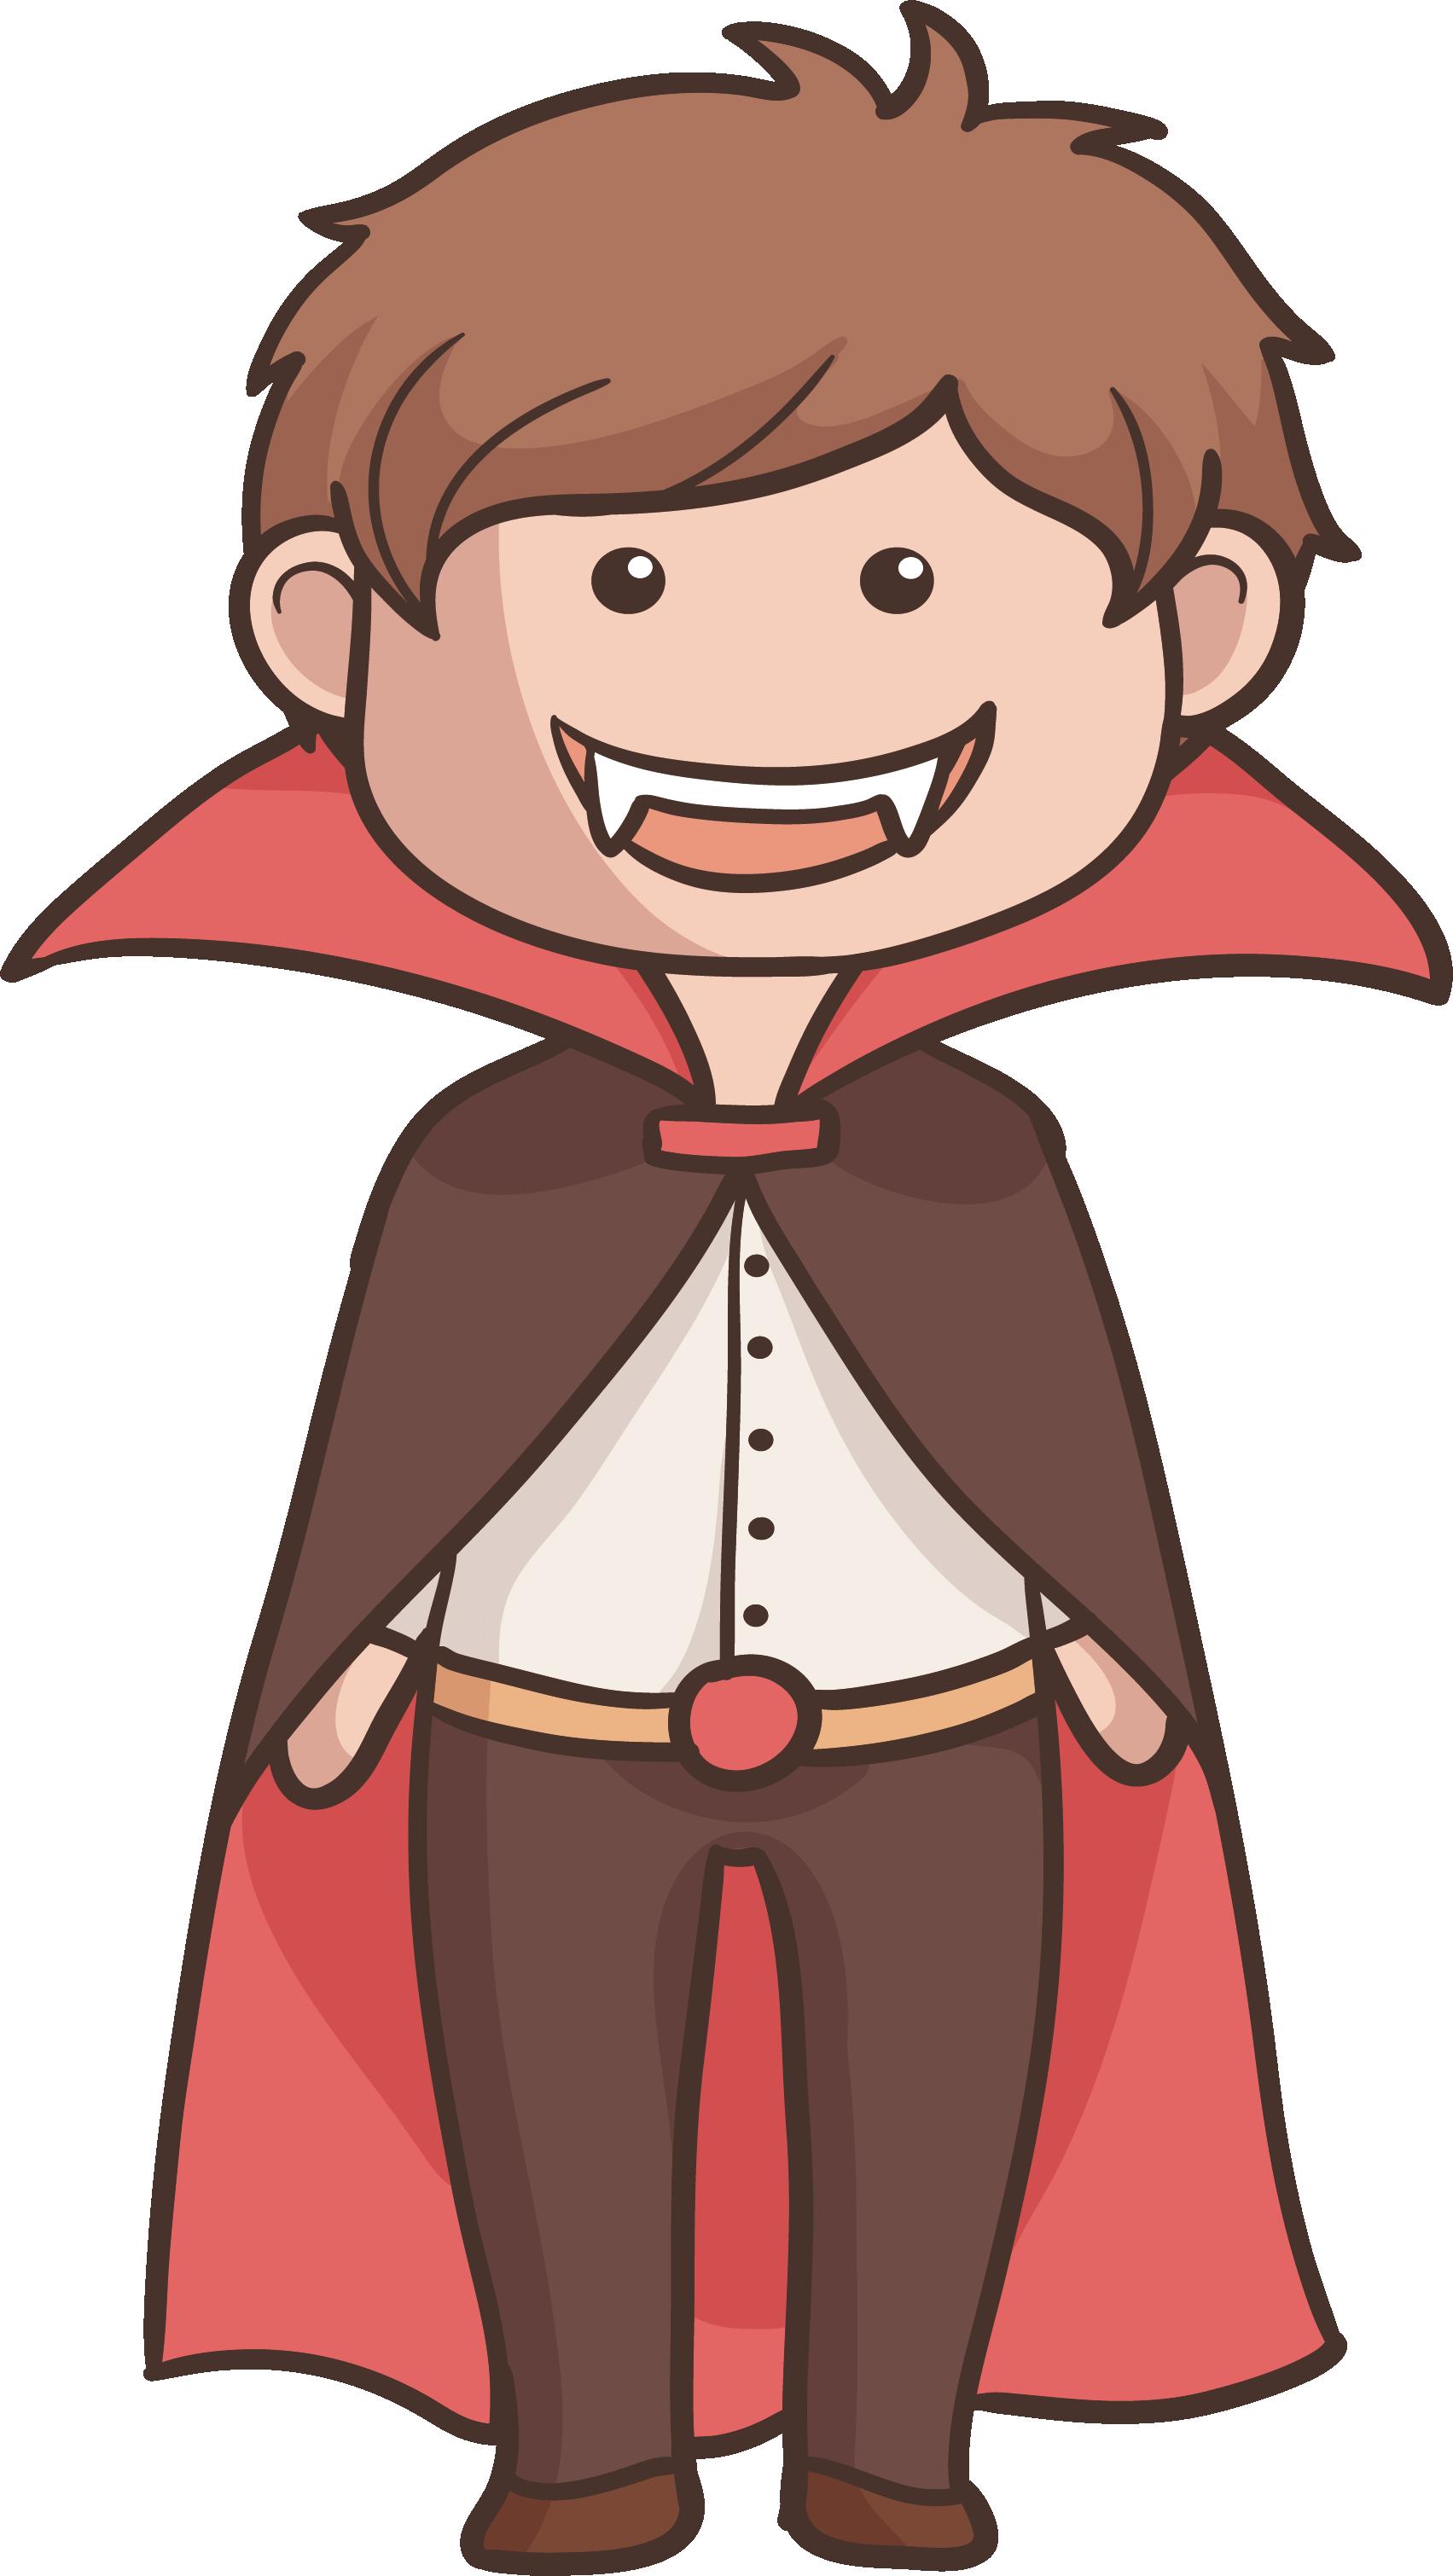 Illustration duke transprent png. Vampire clipart vampire boy